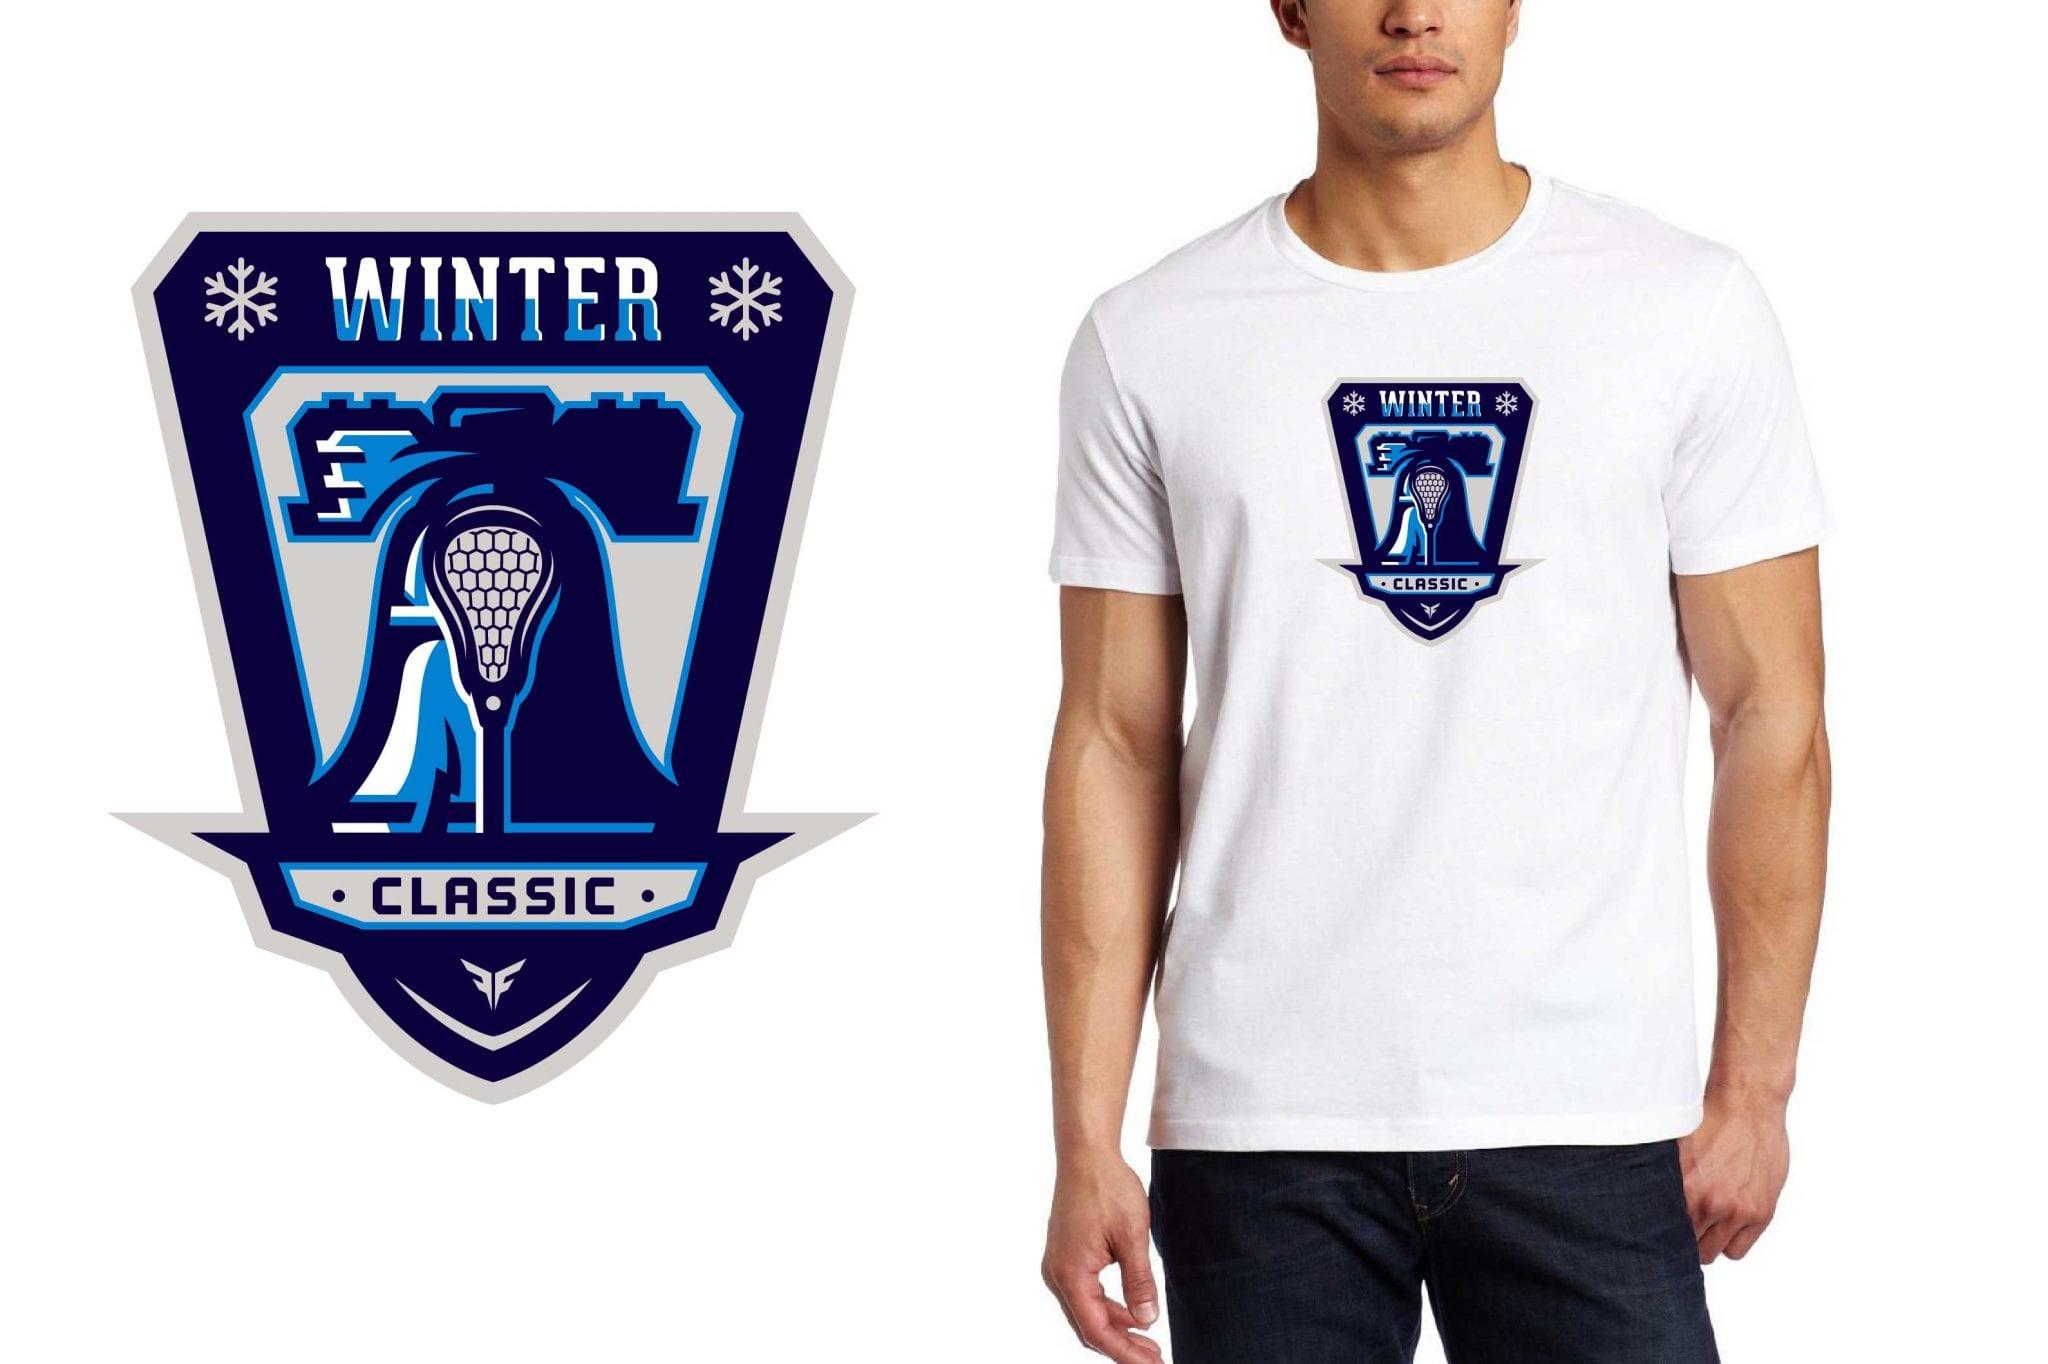 2017 Fusion Winter Classic vector logo design for lacrosse t-shirt UrArtStudio